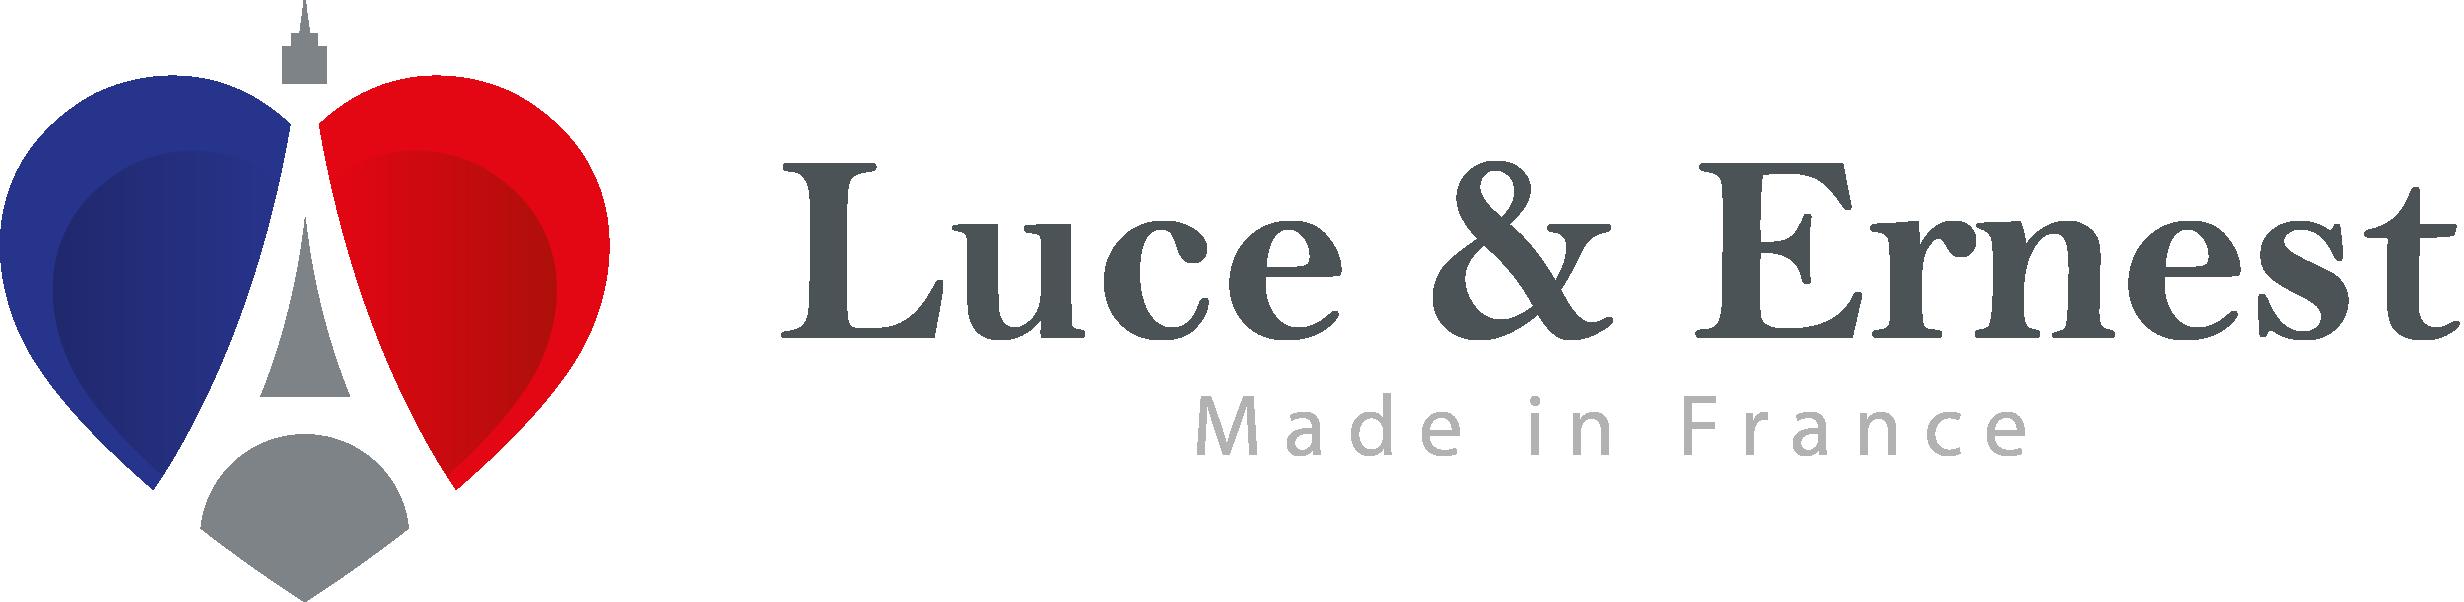 Luce & Ernest tr long 1